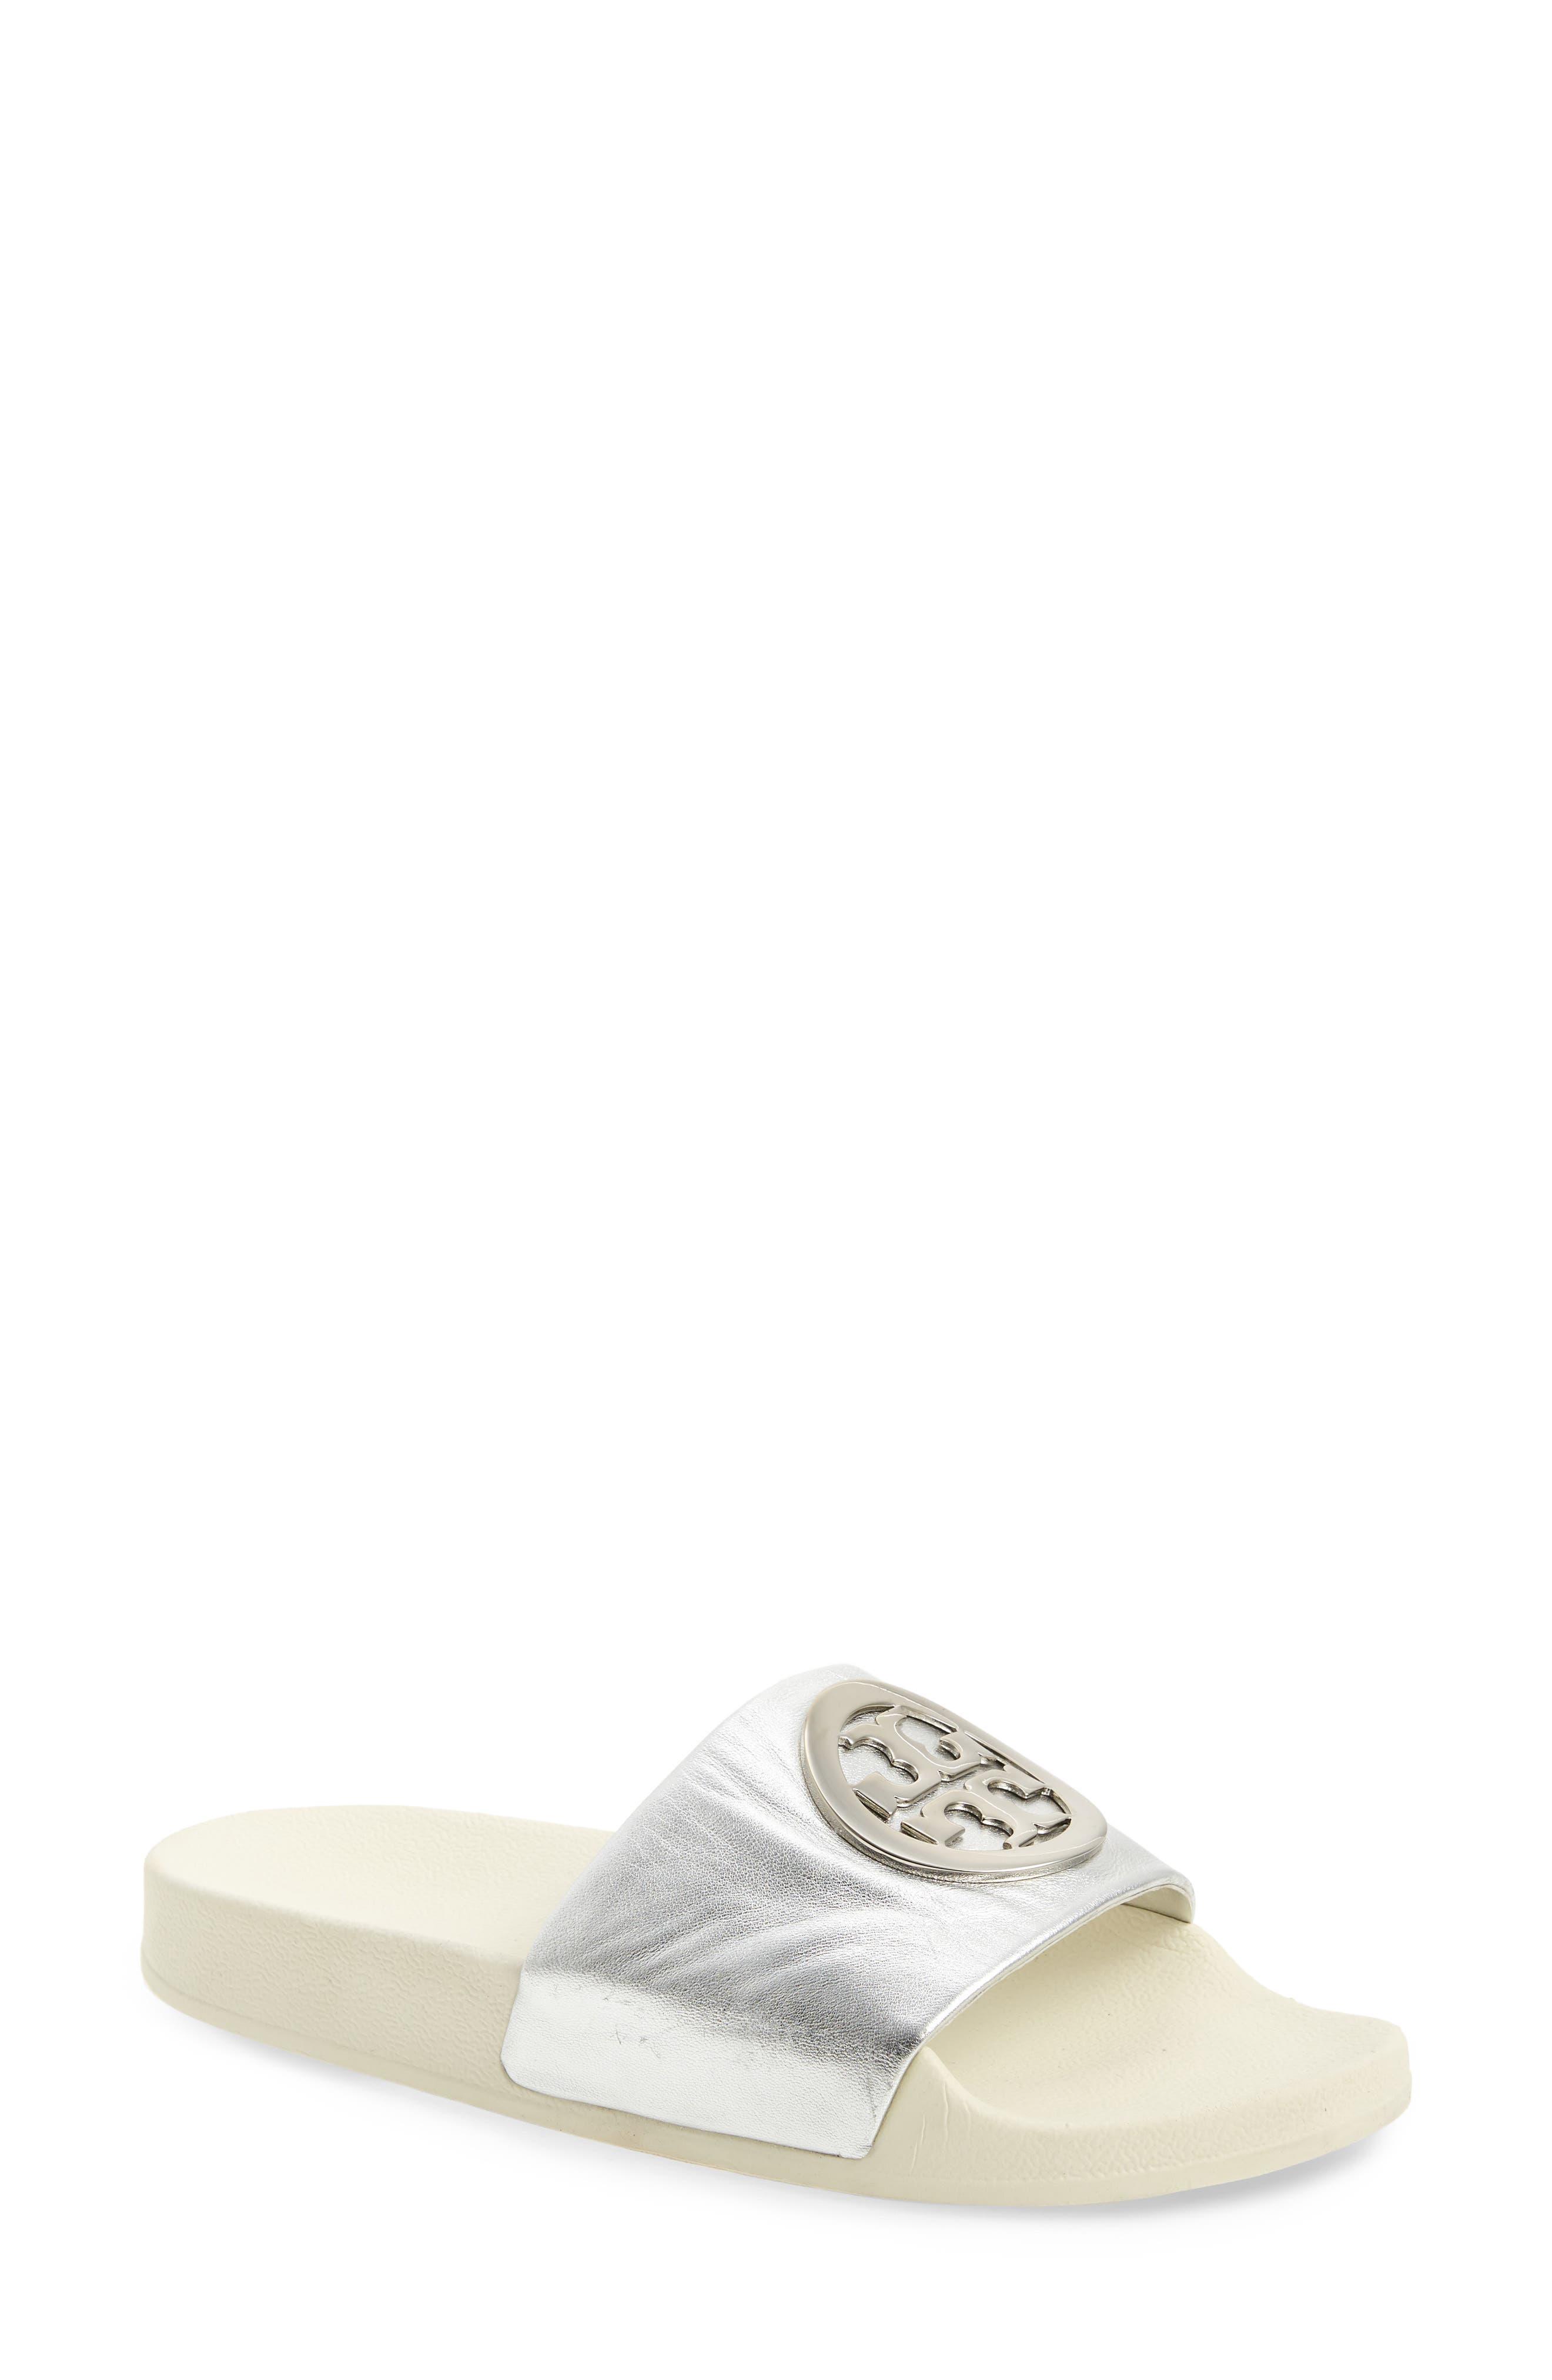 Lina Slide Sandal,                         Main,                         color, Silver